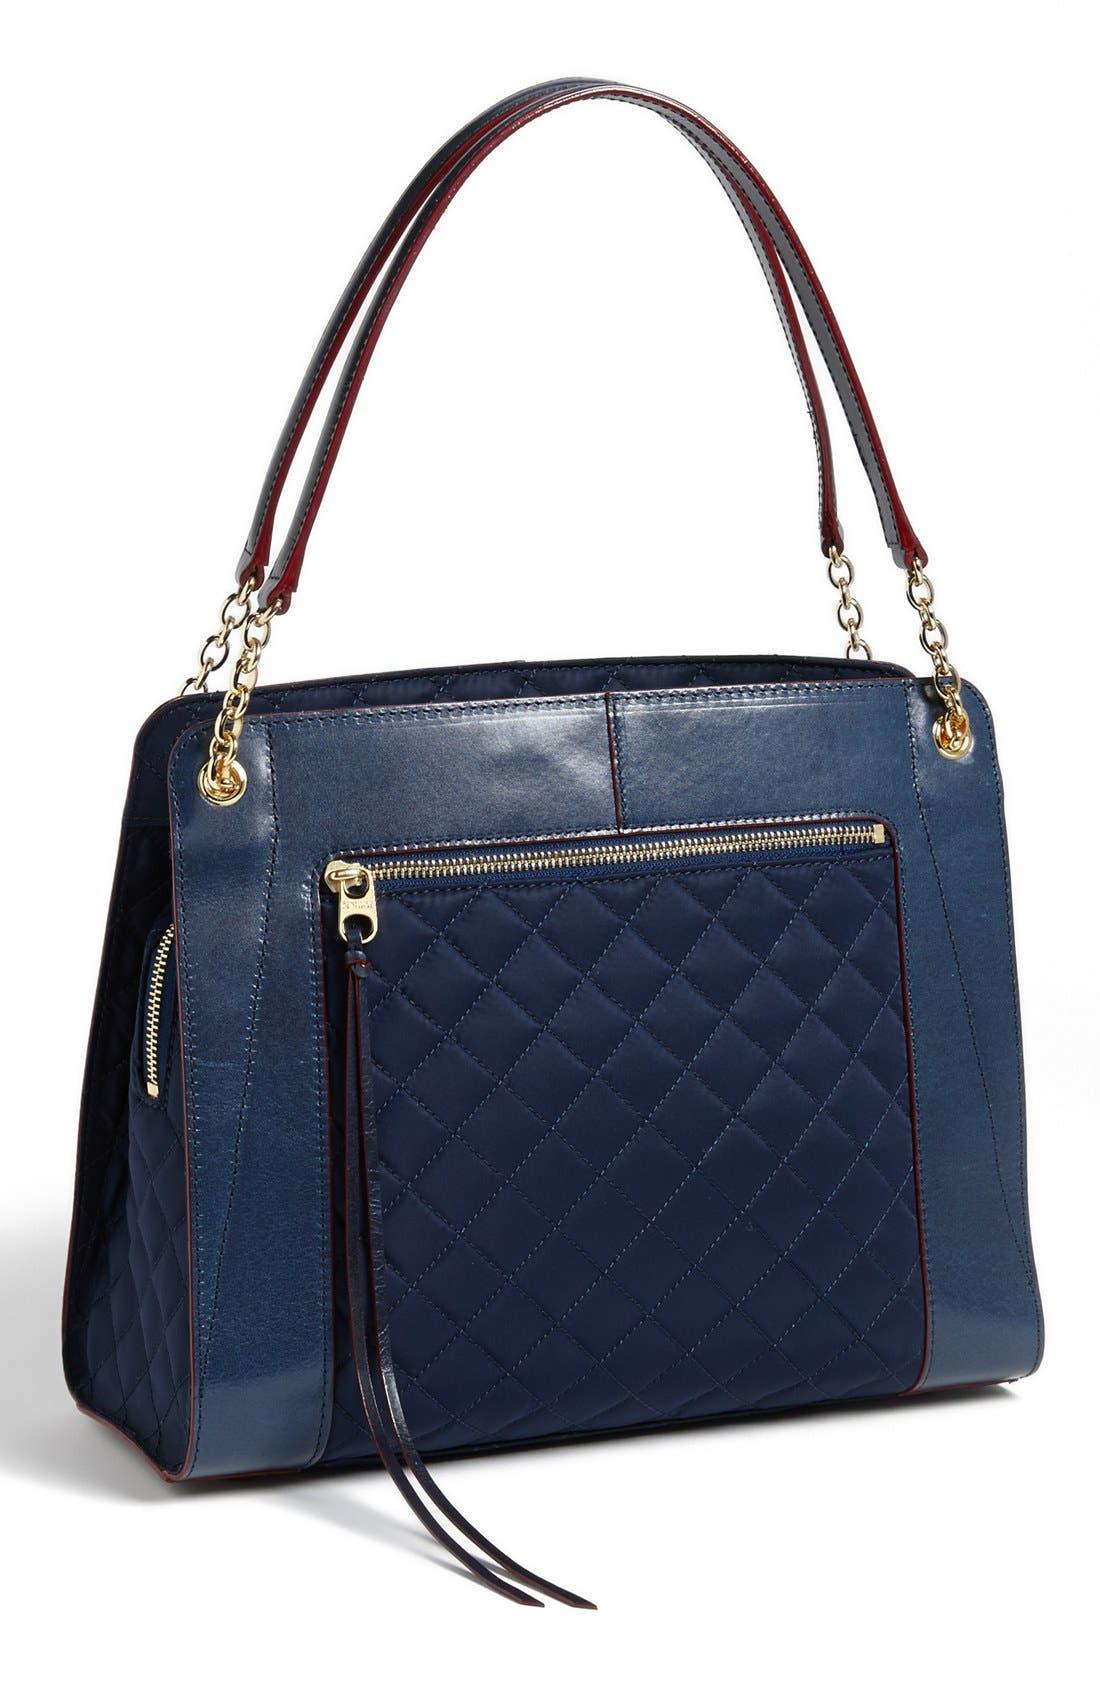 Main Image - MZ Wallace 'Clementine' Shoulder Bag